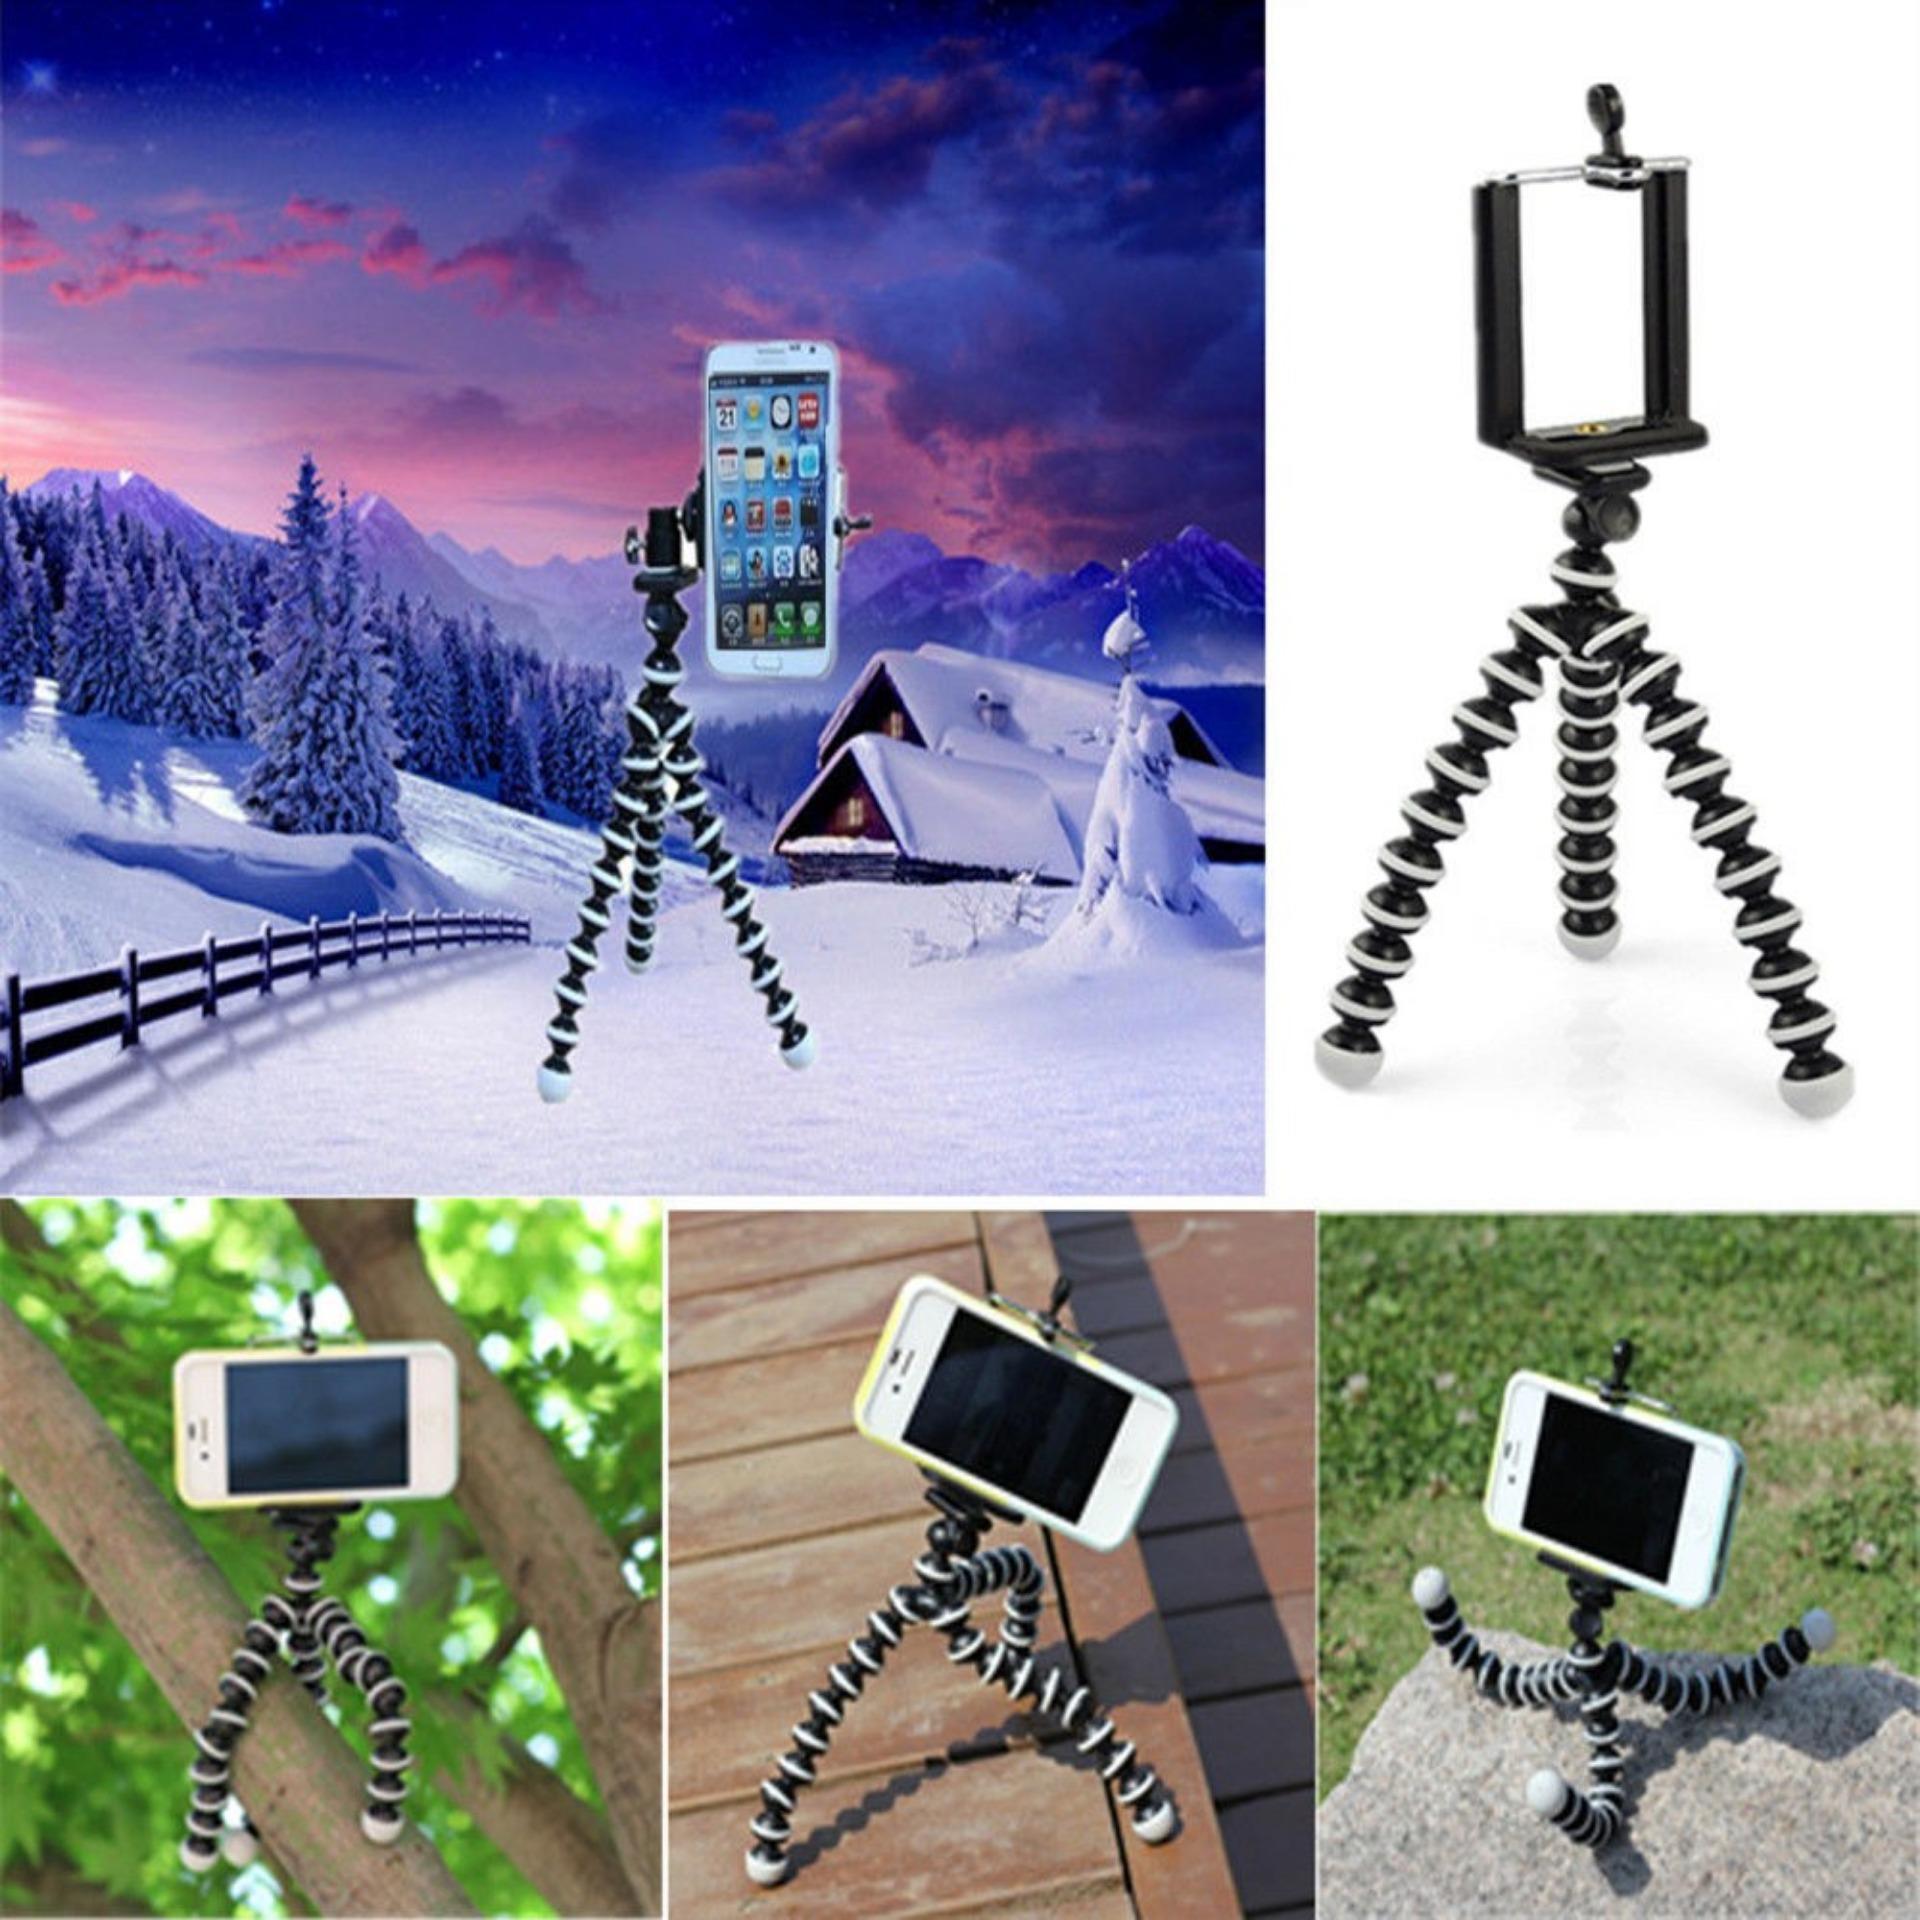 Tripod Flexible Gorilla With Holder Stand Mount For Goprocameraslr Gekkopod Mini Smartphone Portable And Fleksibel Cumi Fbl Gopro Camera Slr